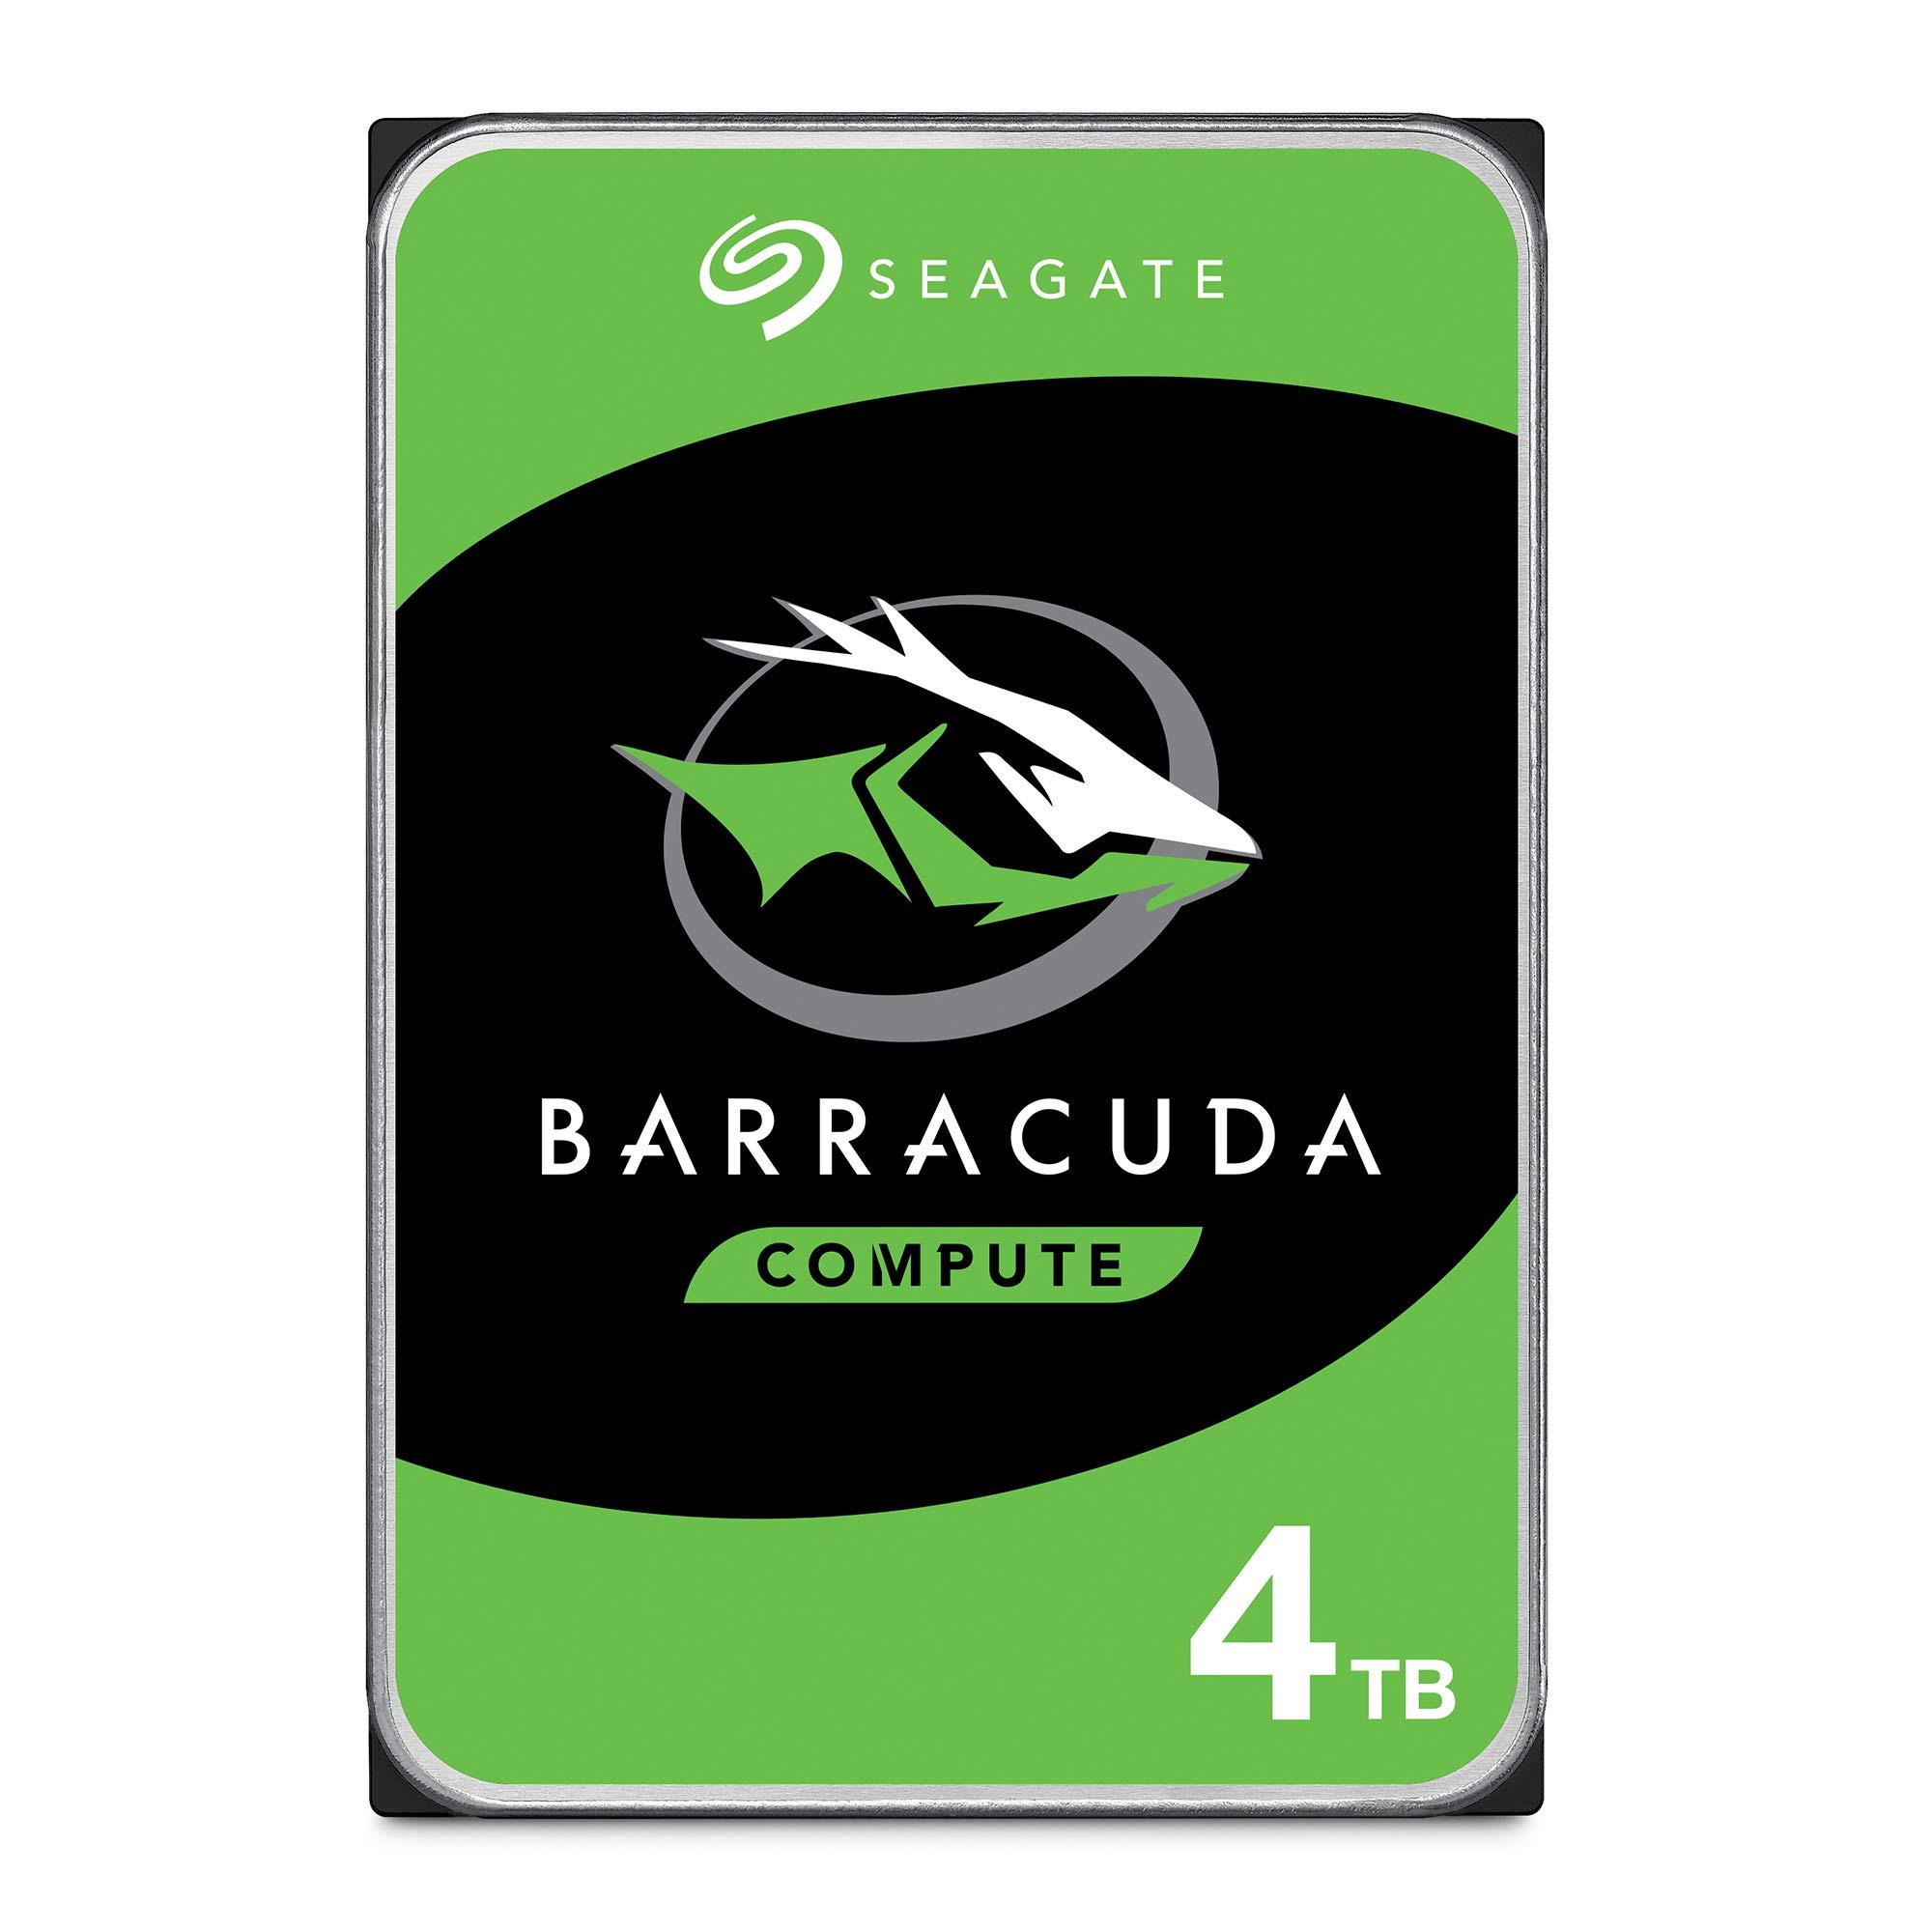 HDD 4TB SATA Seagate BarraCuda 4TB 3.5in 6 Gb/s 5400 RPM 256